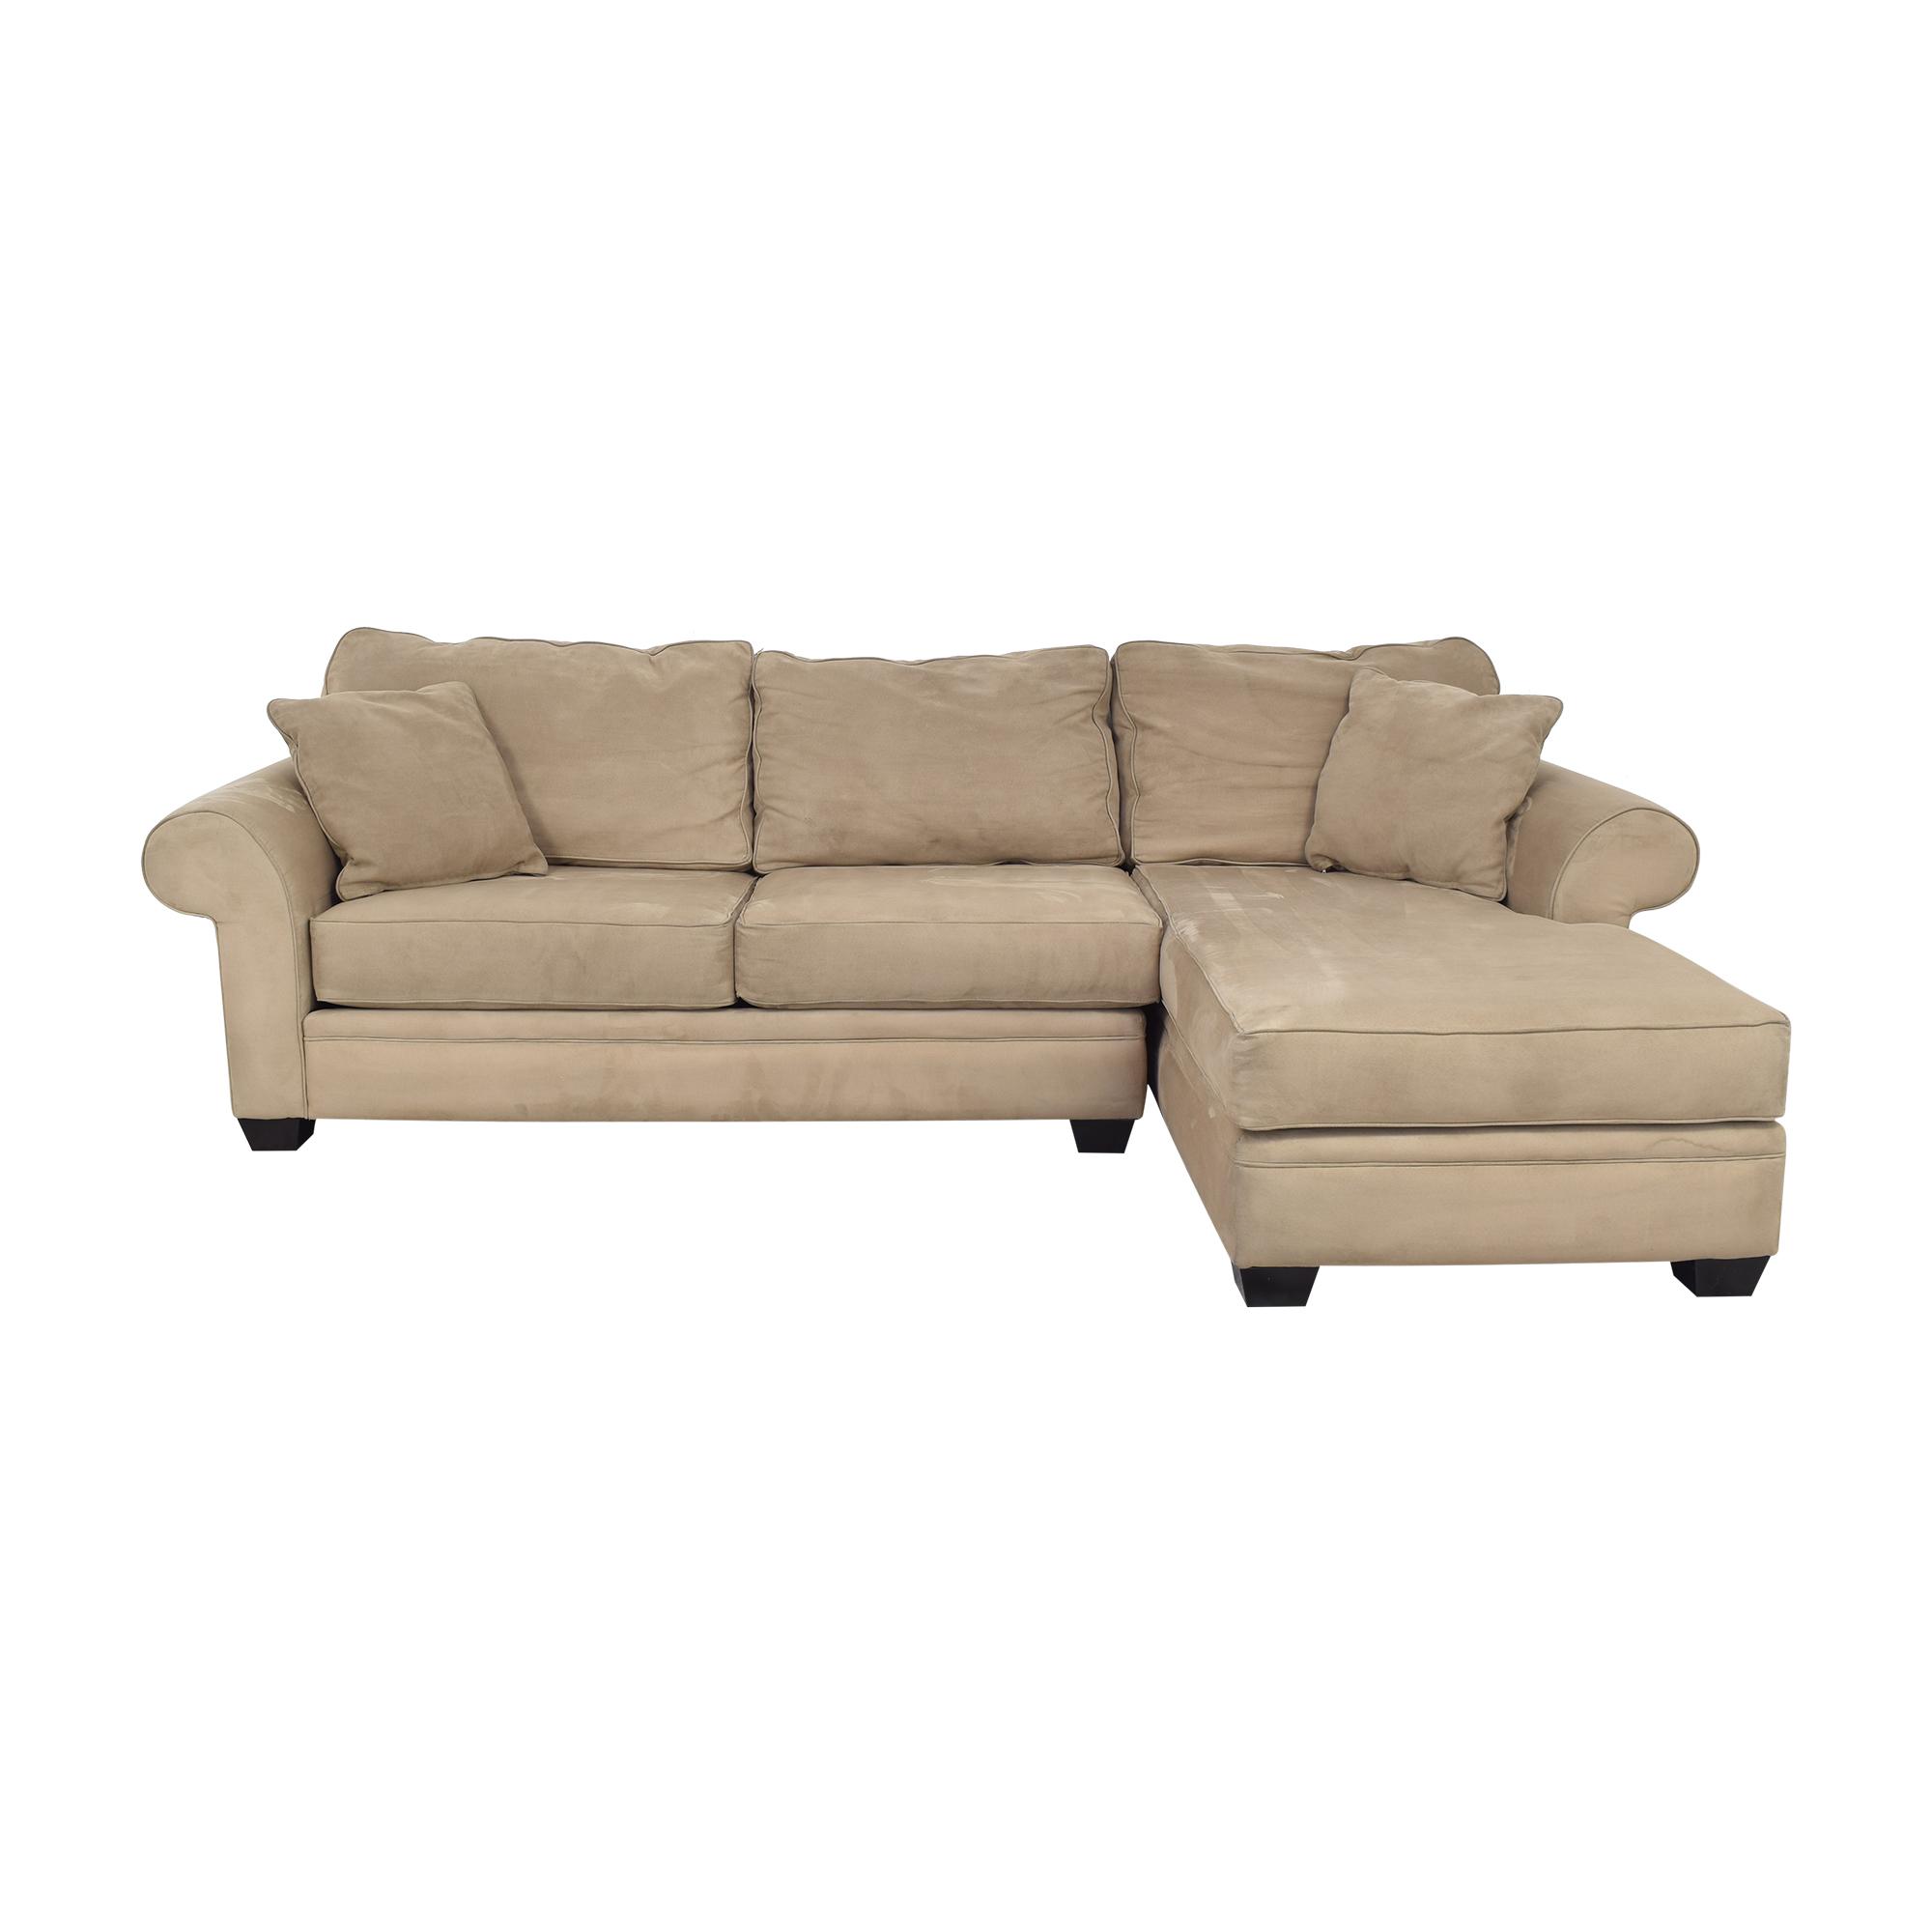 buy Jonathan Louis Chaise Sectional Sofa Macy's Sofas